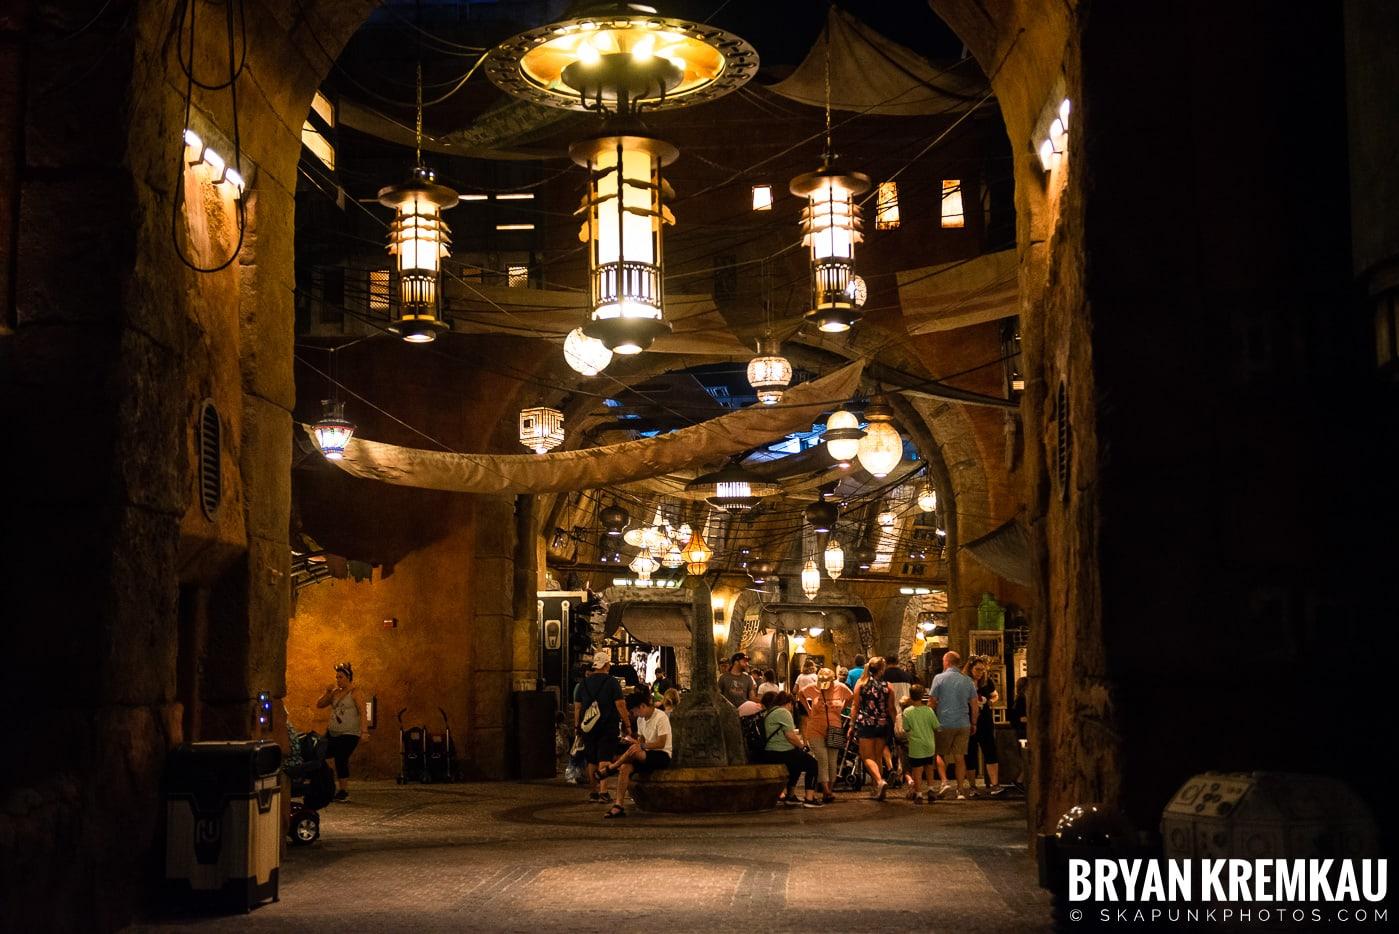 Walt Disney World Vacation: Day 5 (Animal Kingdom / Disney's Hollywood Studios) - 10.3.19 (37)